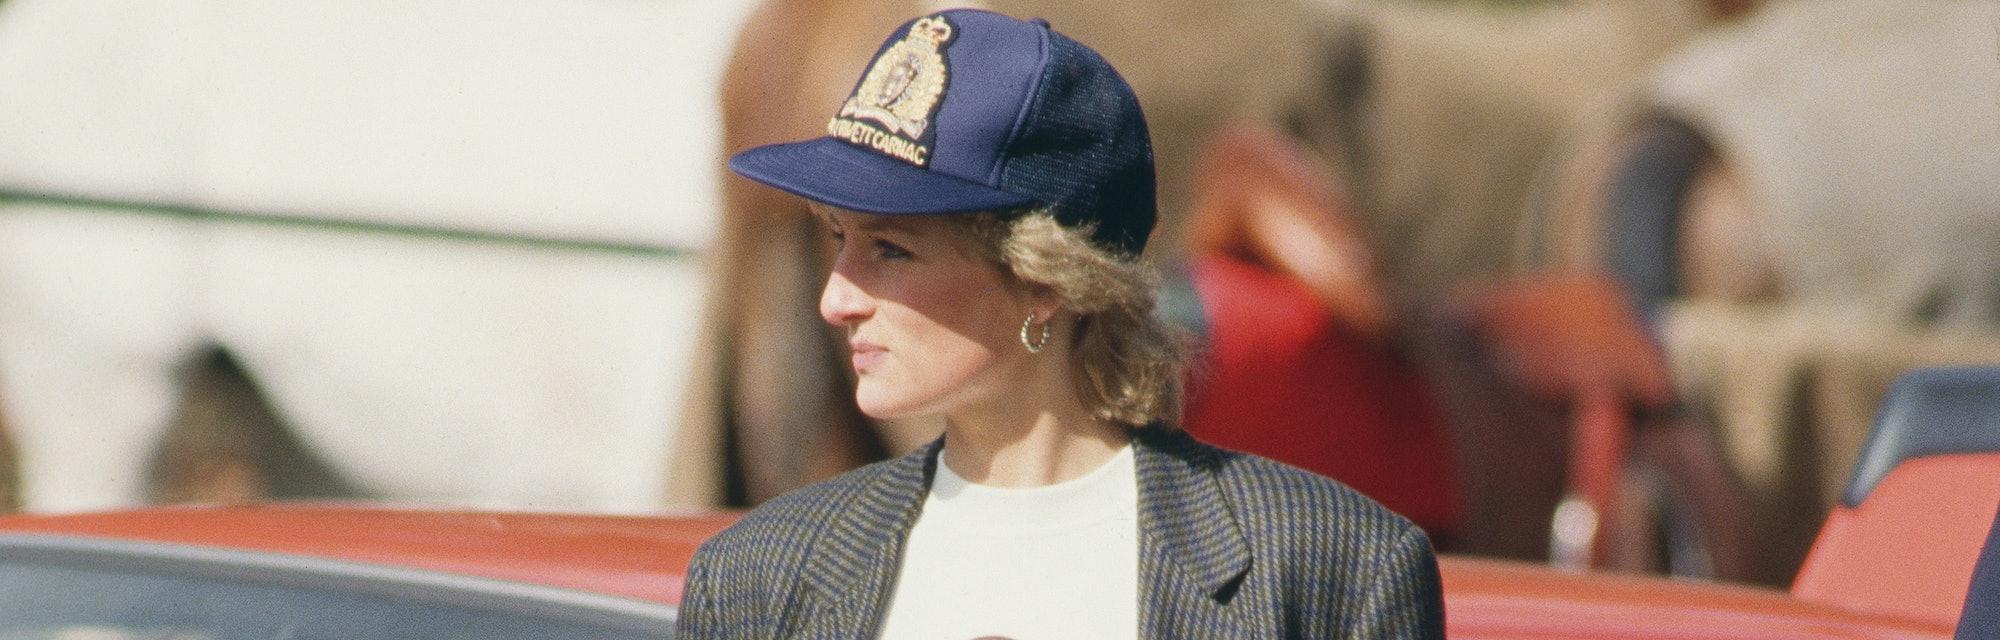 Princess Diana had some great fall looks.